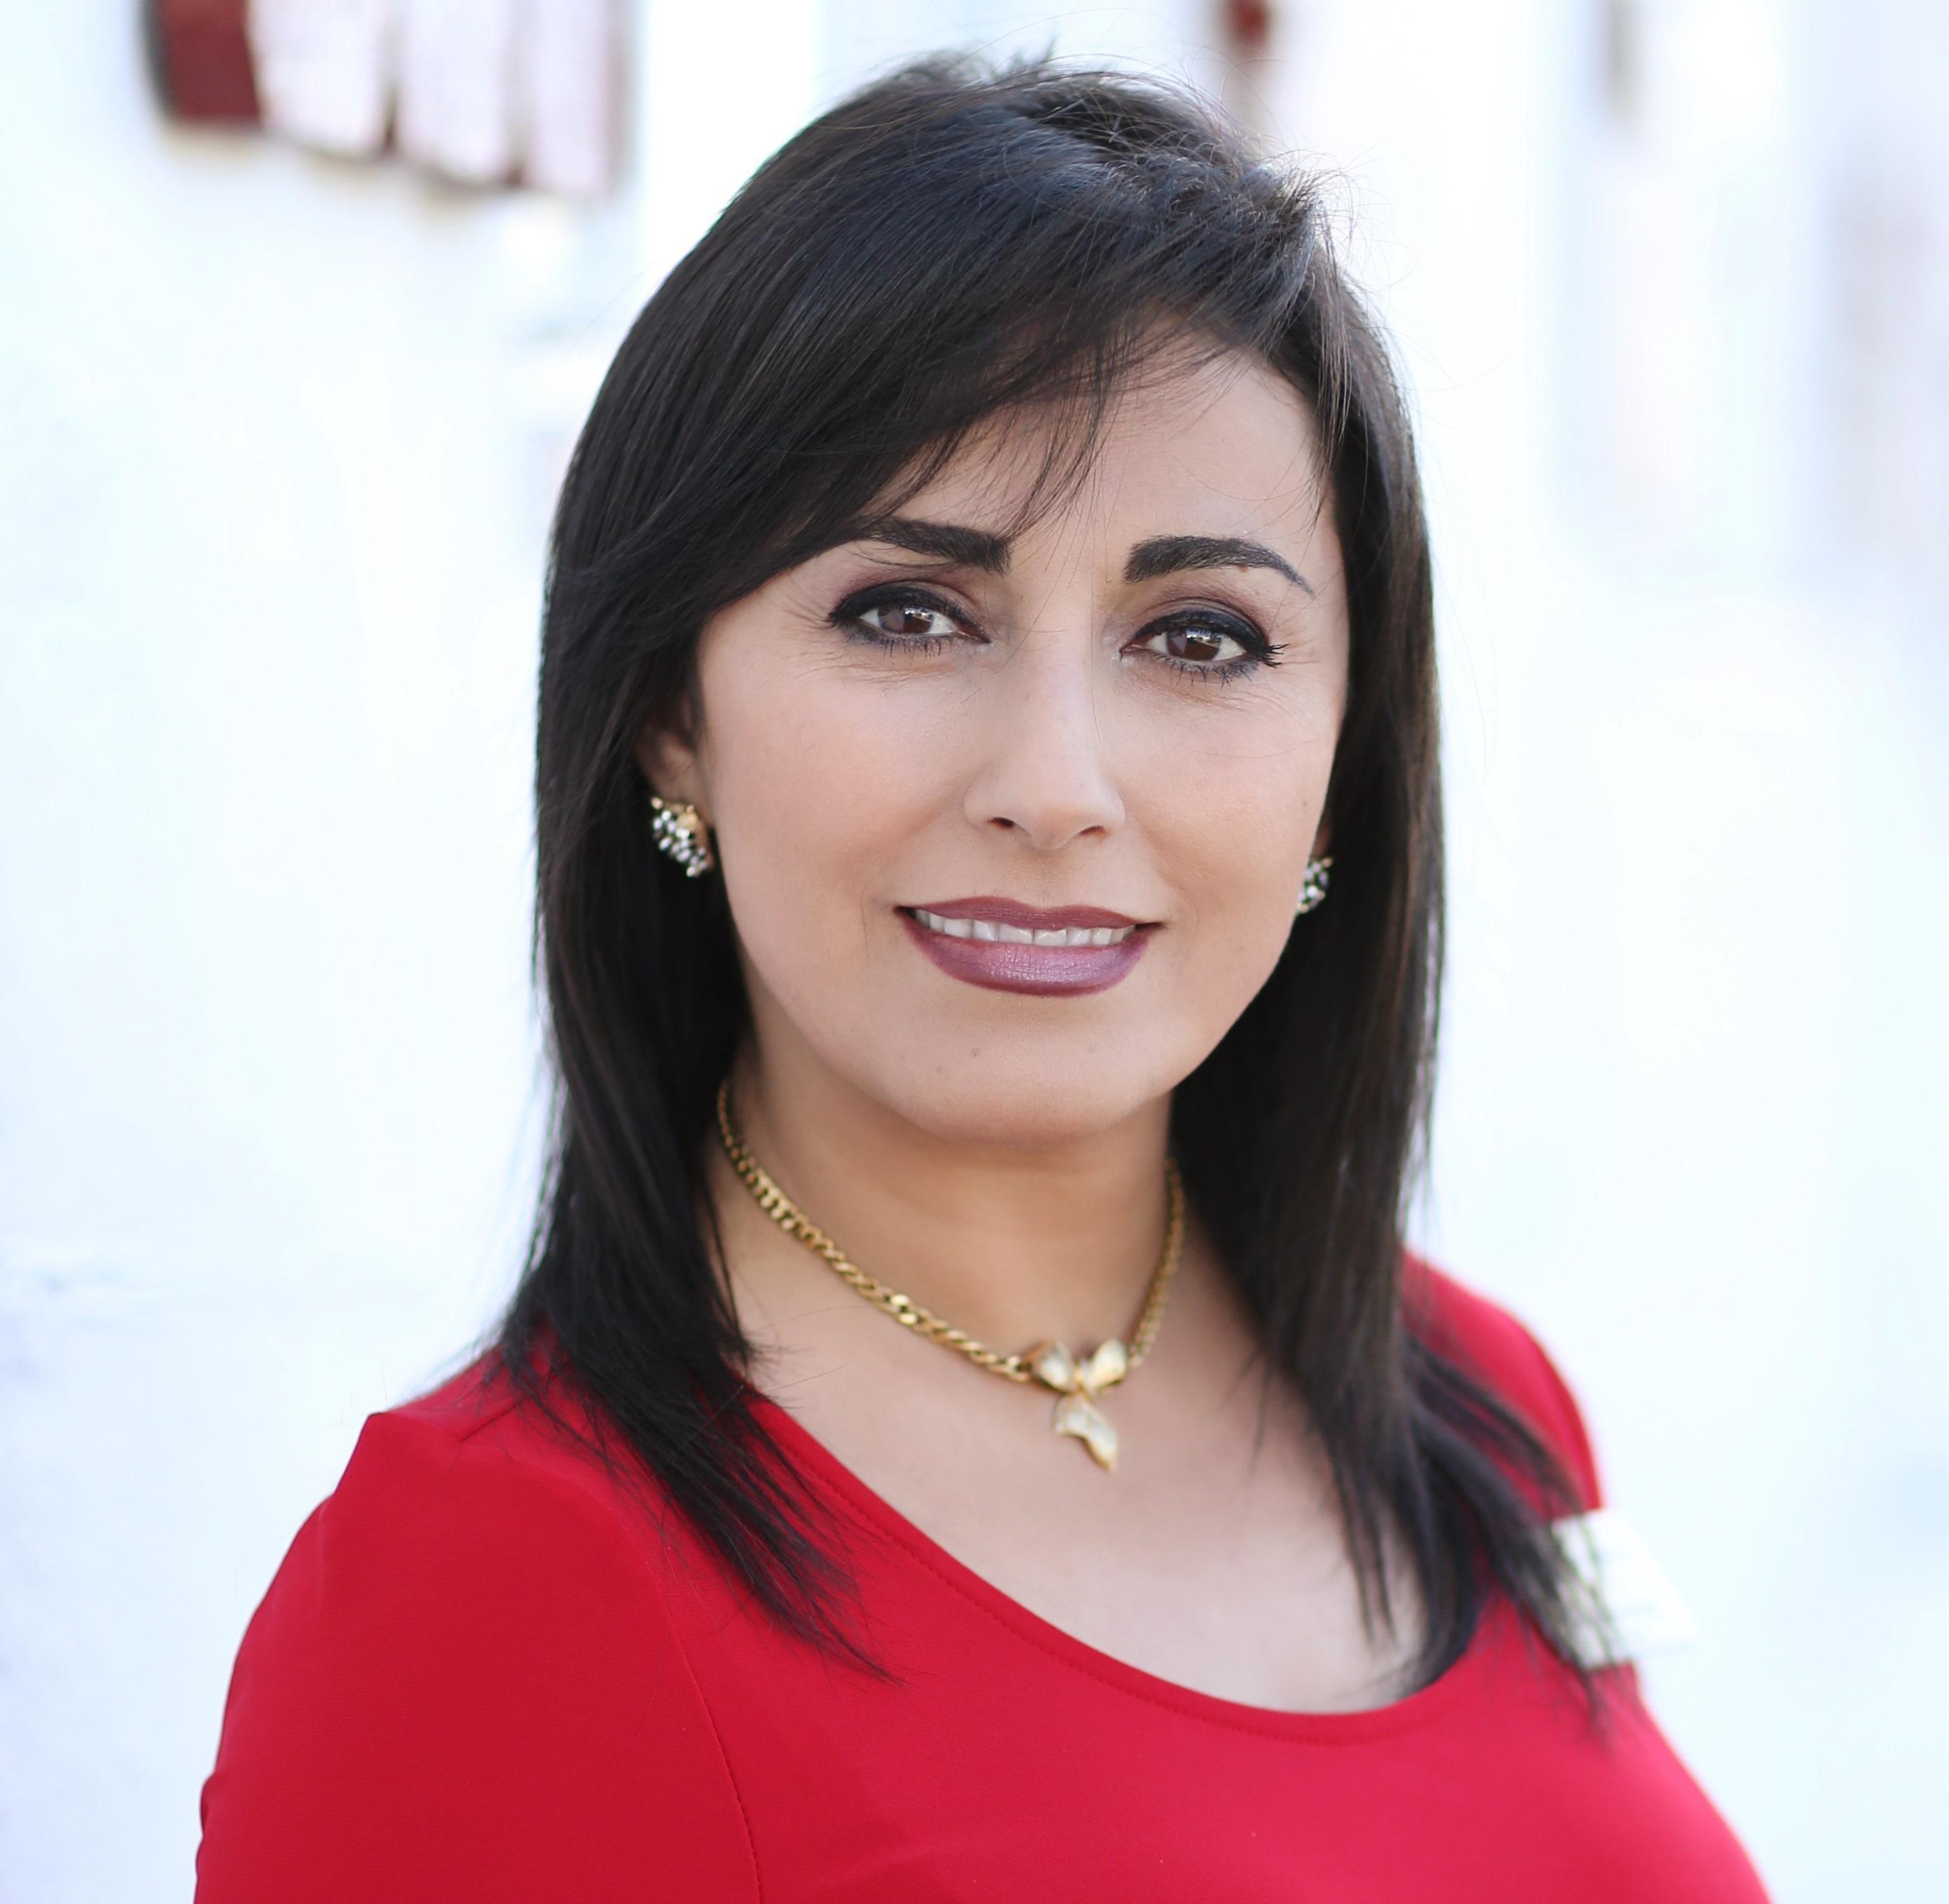 Parisa Houshangi